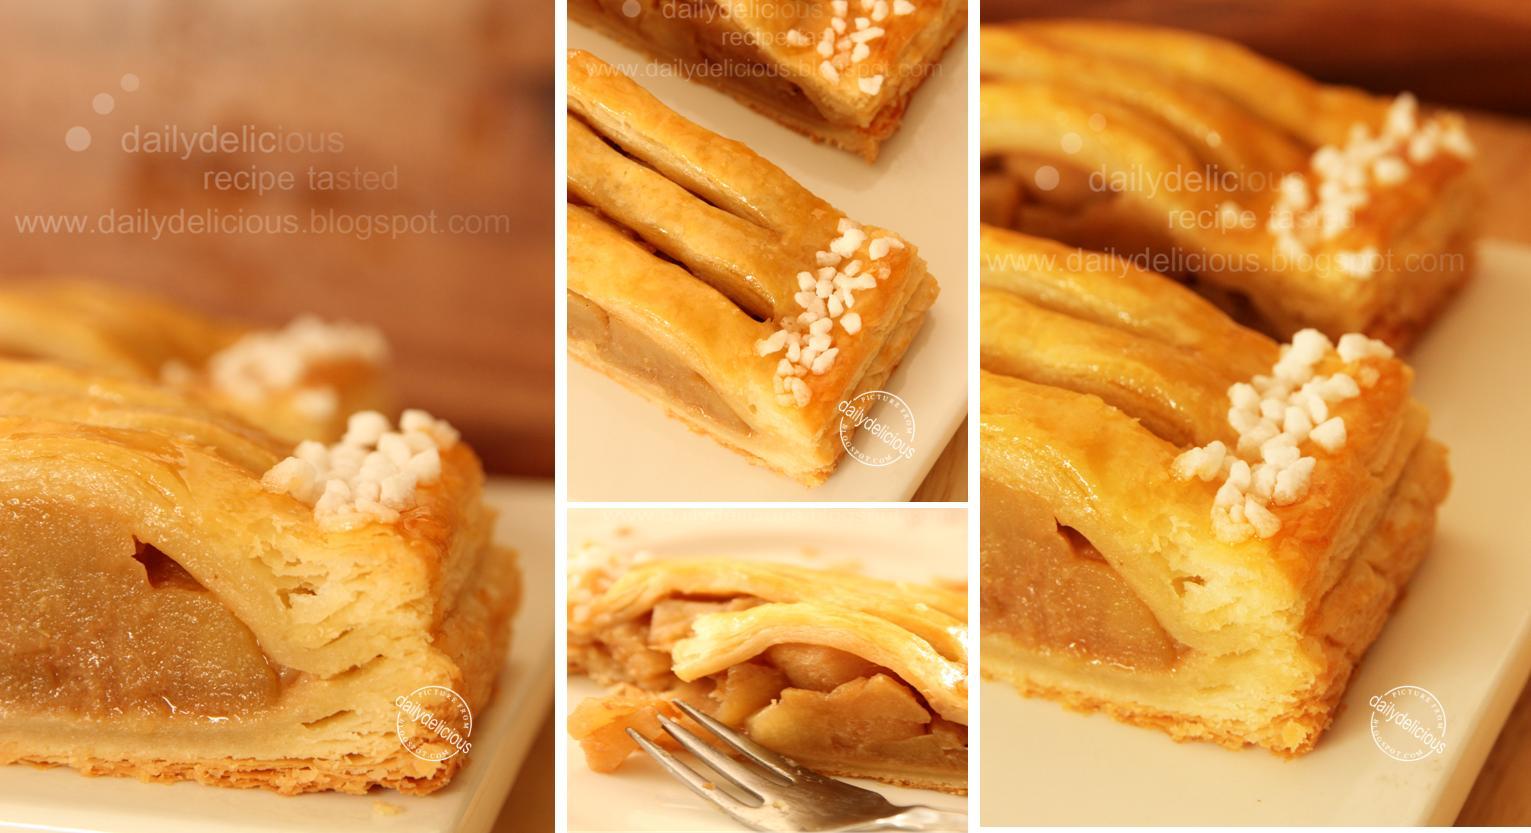 Afternoon Baking With Grandma Redvelvet Cake